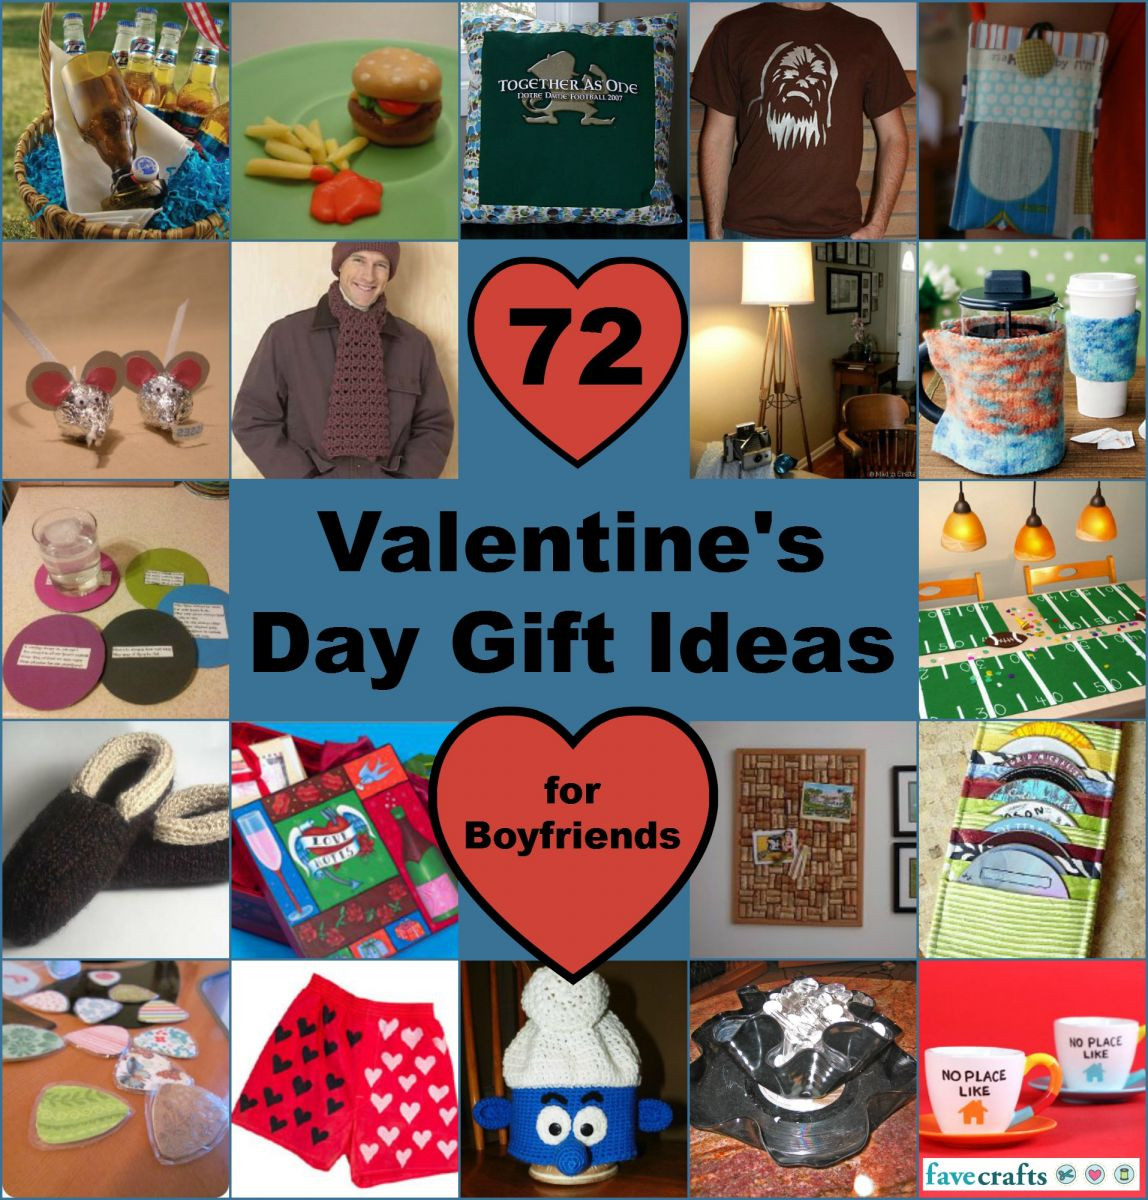 Best Guy Valentines Day Gift Ideas  Last Minute Valentine s Day Crafts FaveCrafts